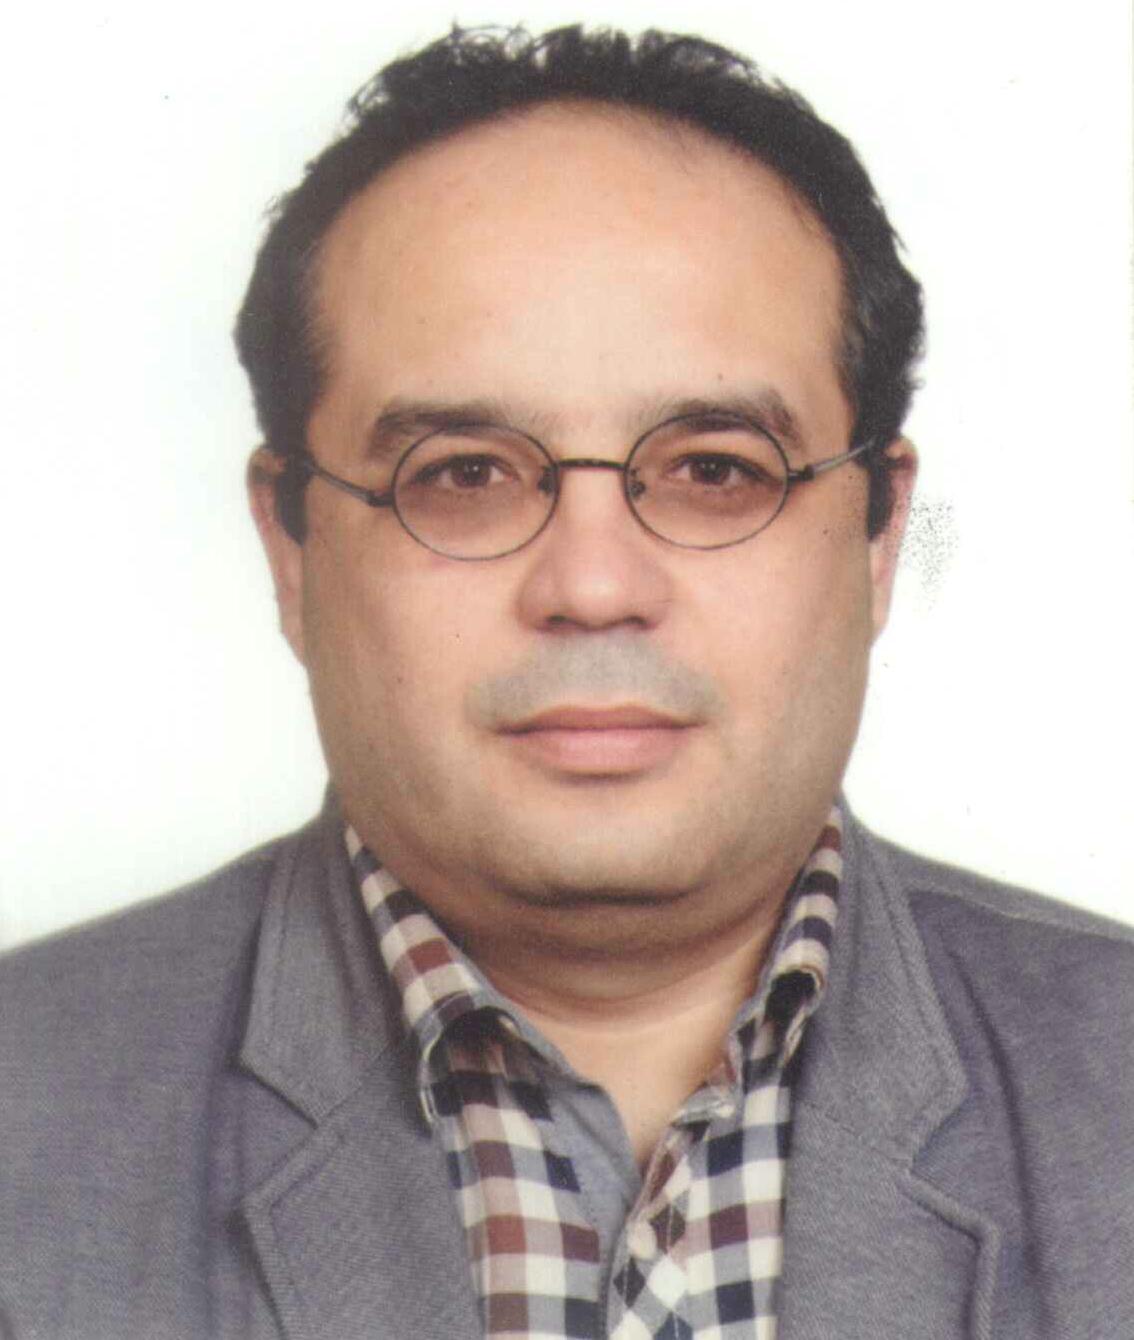 Doç. Dr. Mustafa SEVER Resmi